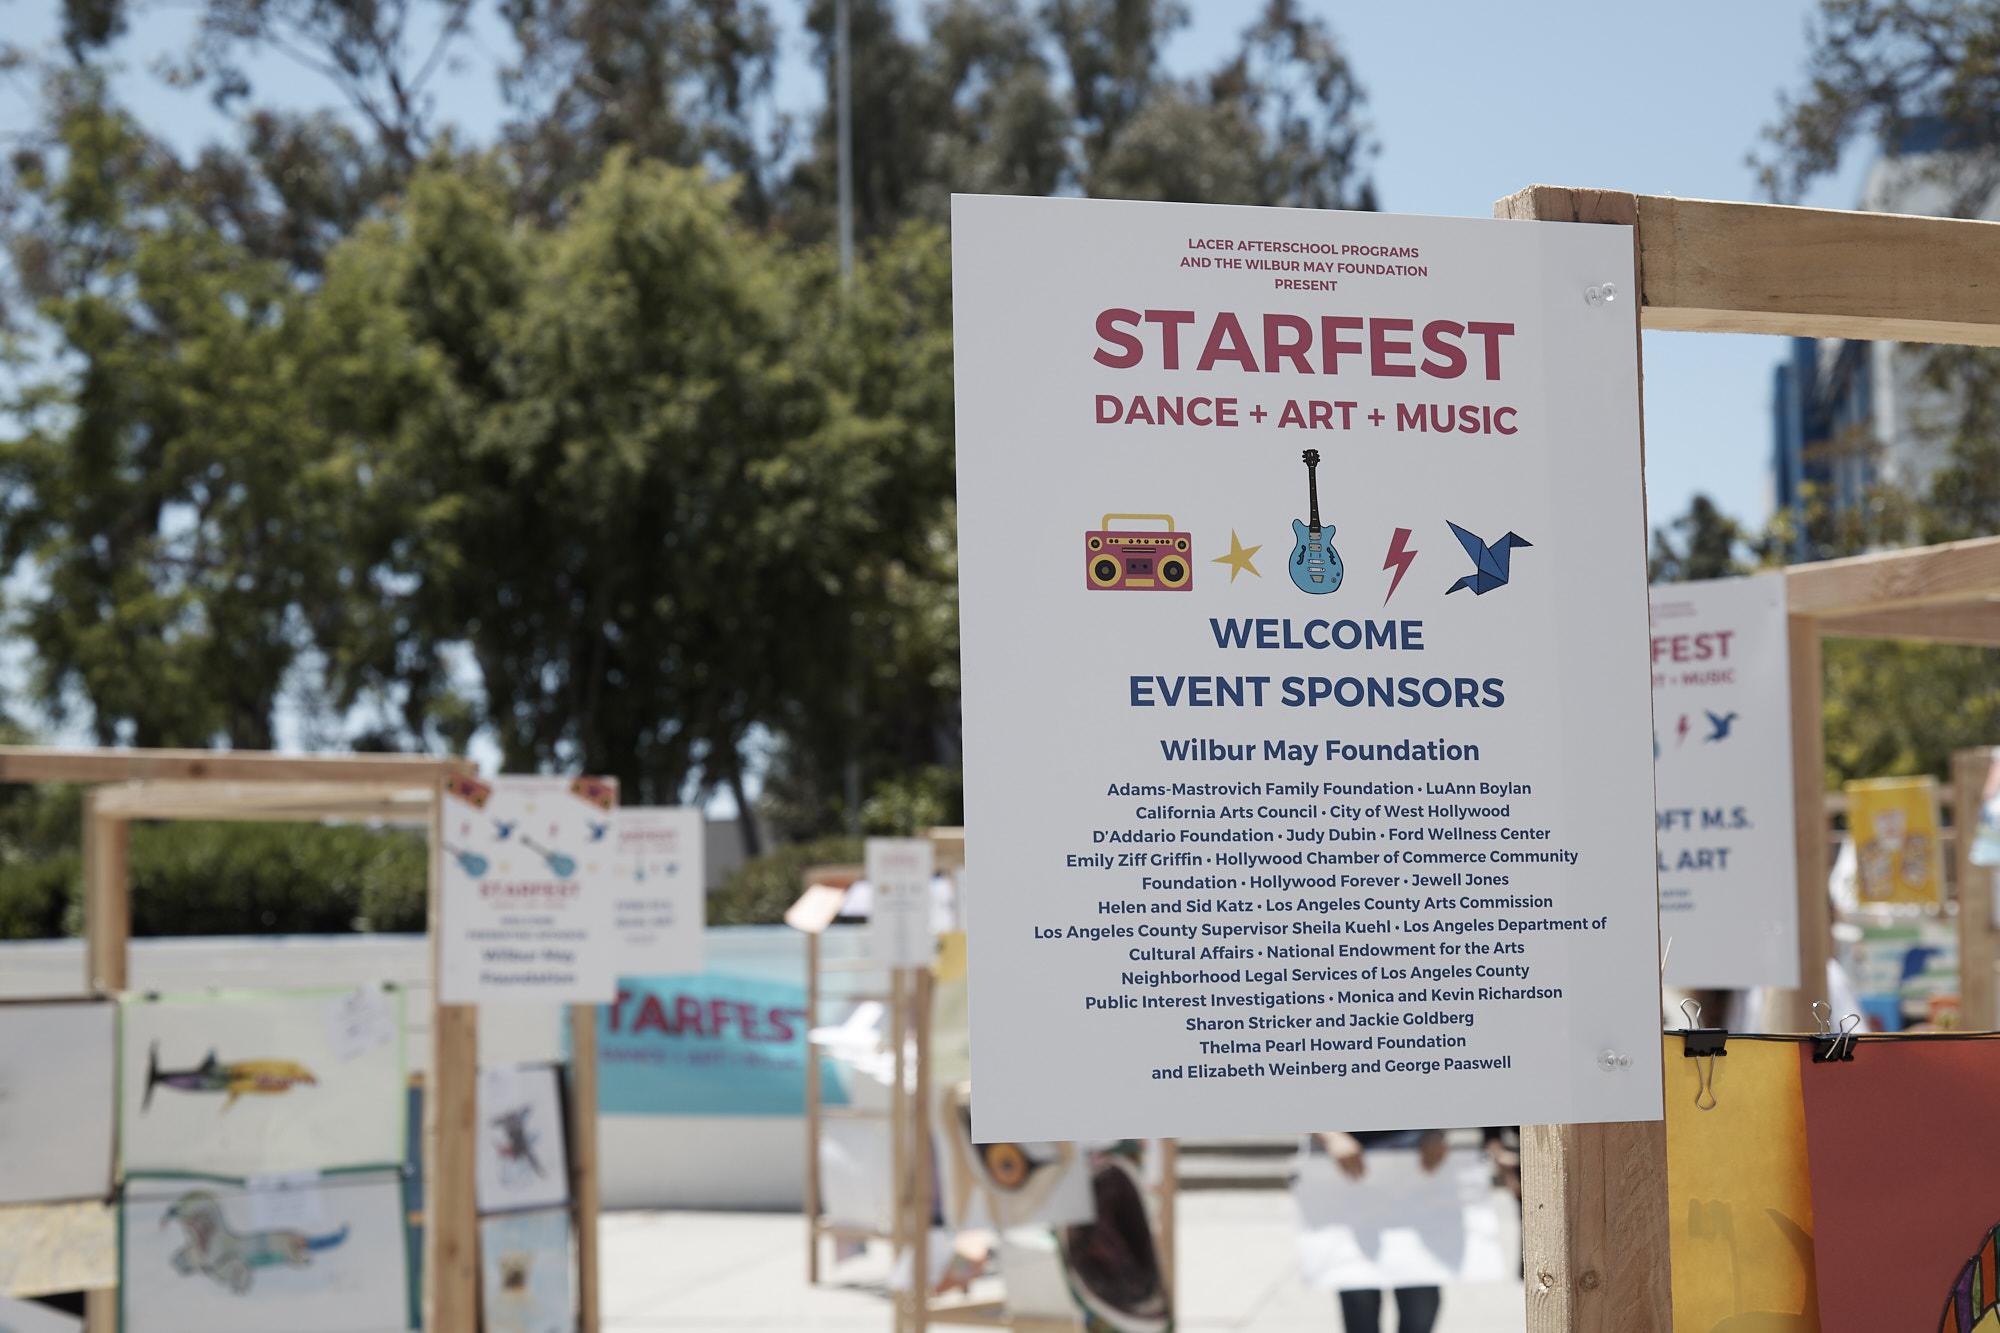 LACER_Starfest_MG_4974.jpg